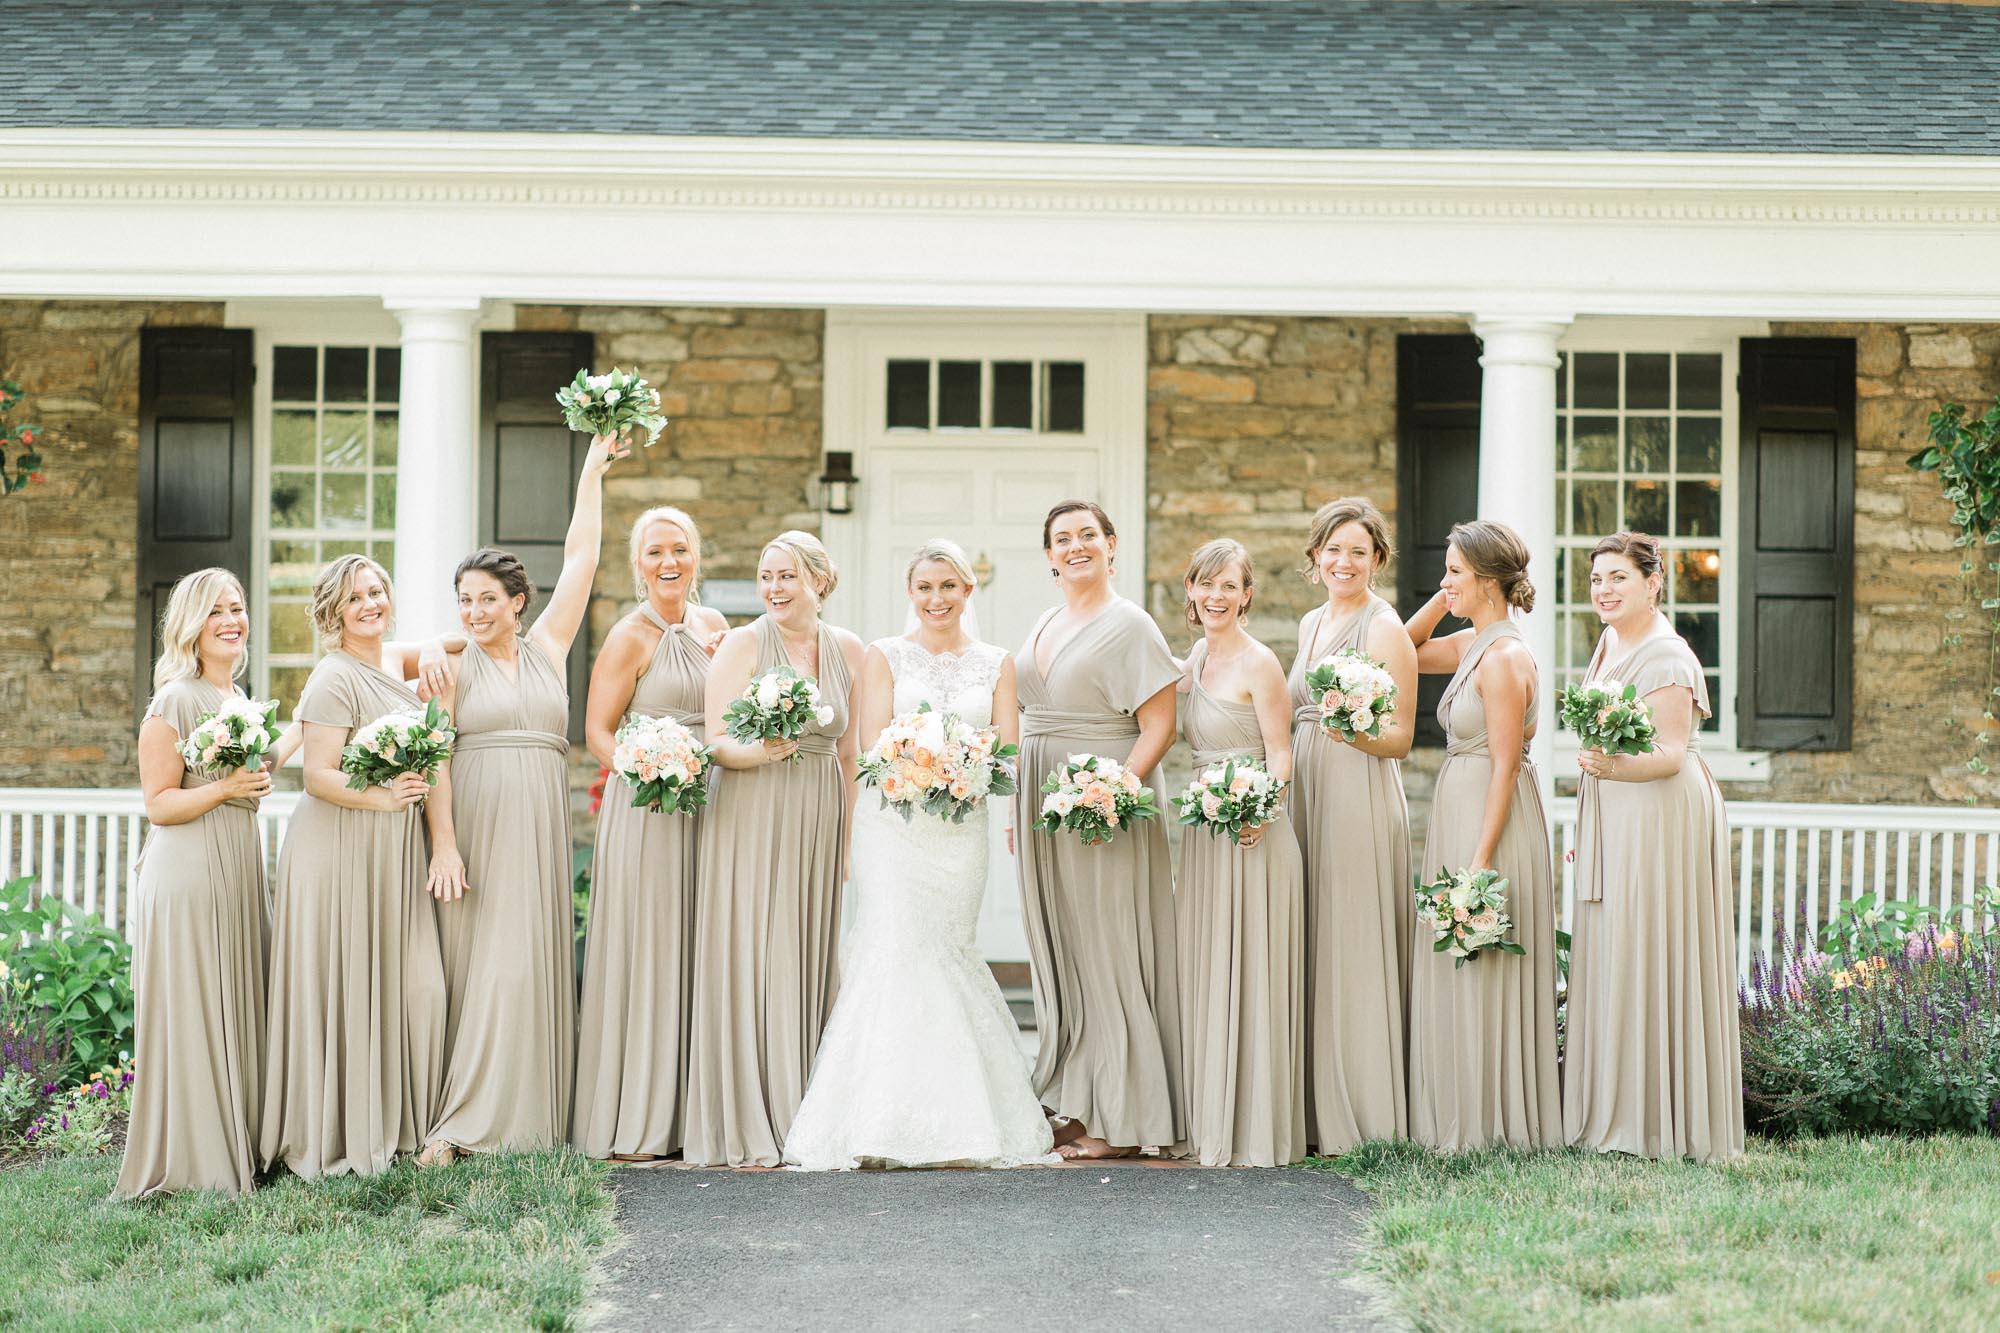 Allenberry-resort-historic-pennsylvania-wedding-22218.jpg